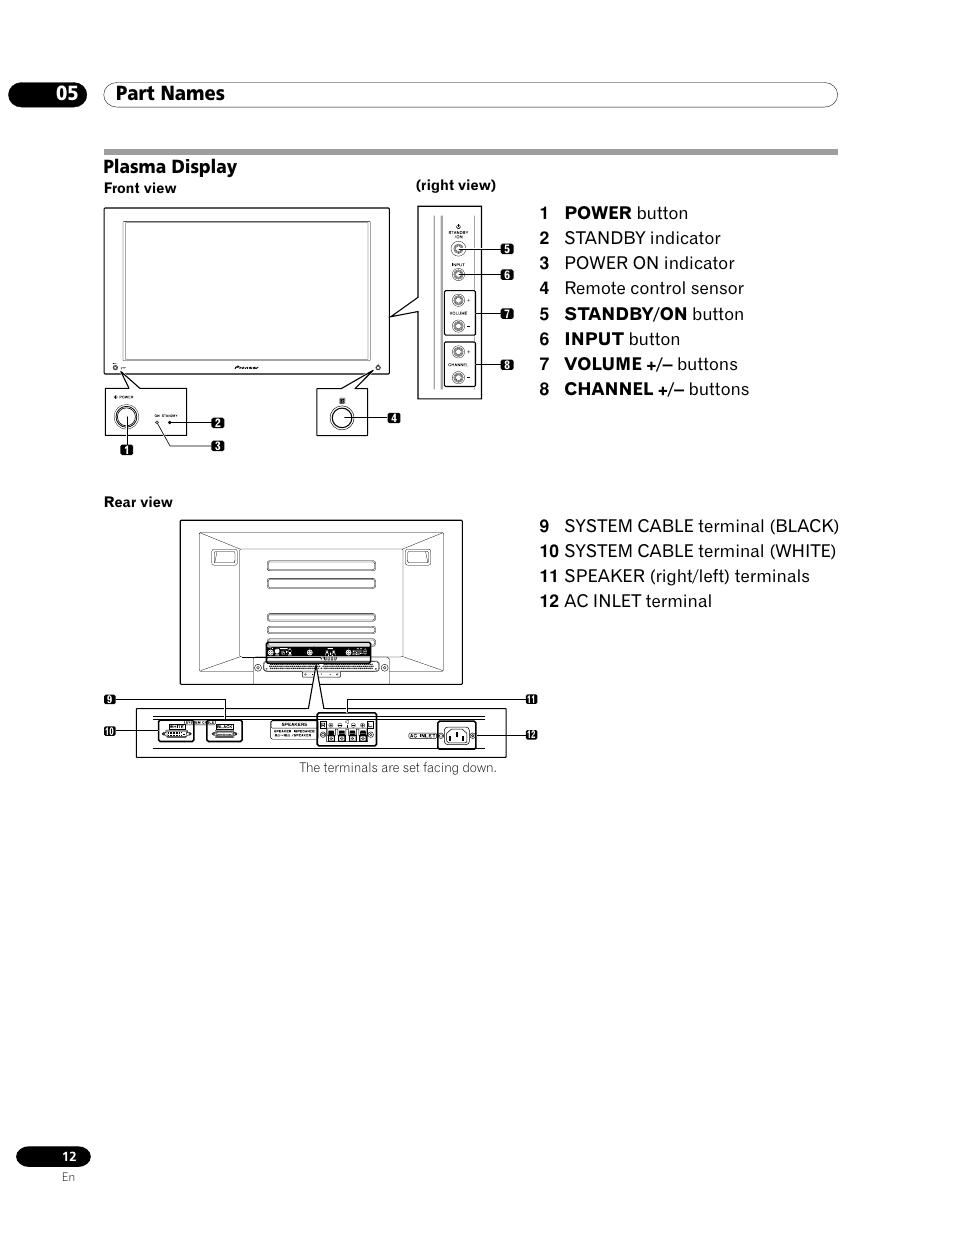 05 part names plasma display pioneer pdp 435fde user manual rh manualsdir com Pioneer Plasma HDMI Connection Pioneer 50 Plasma TV